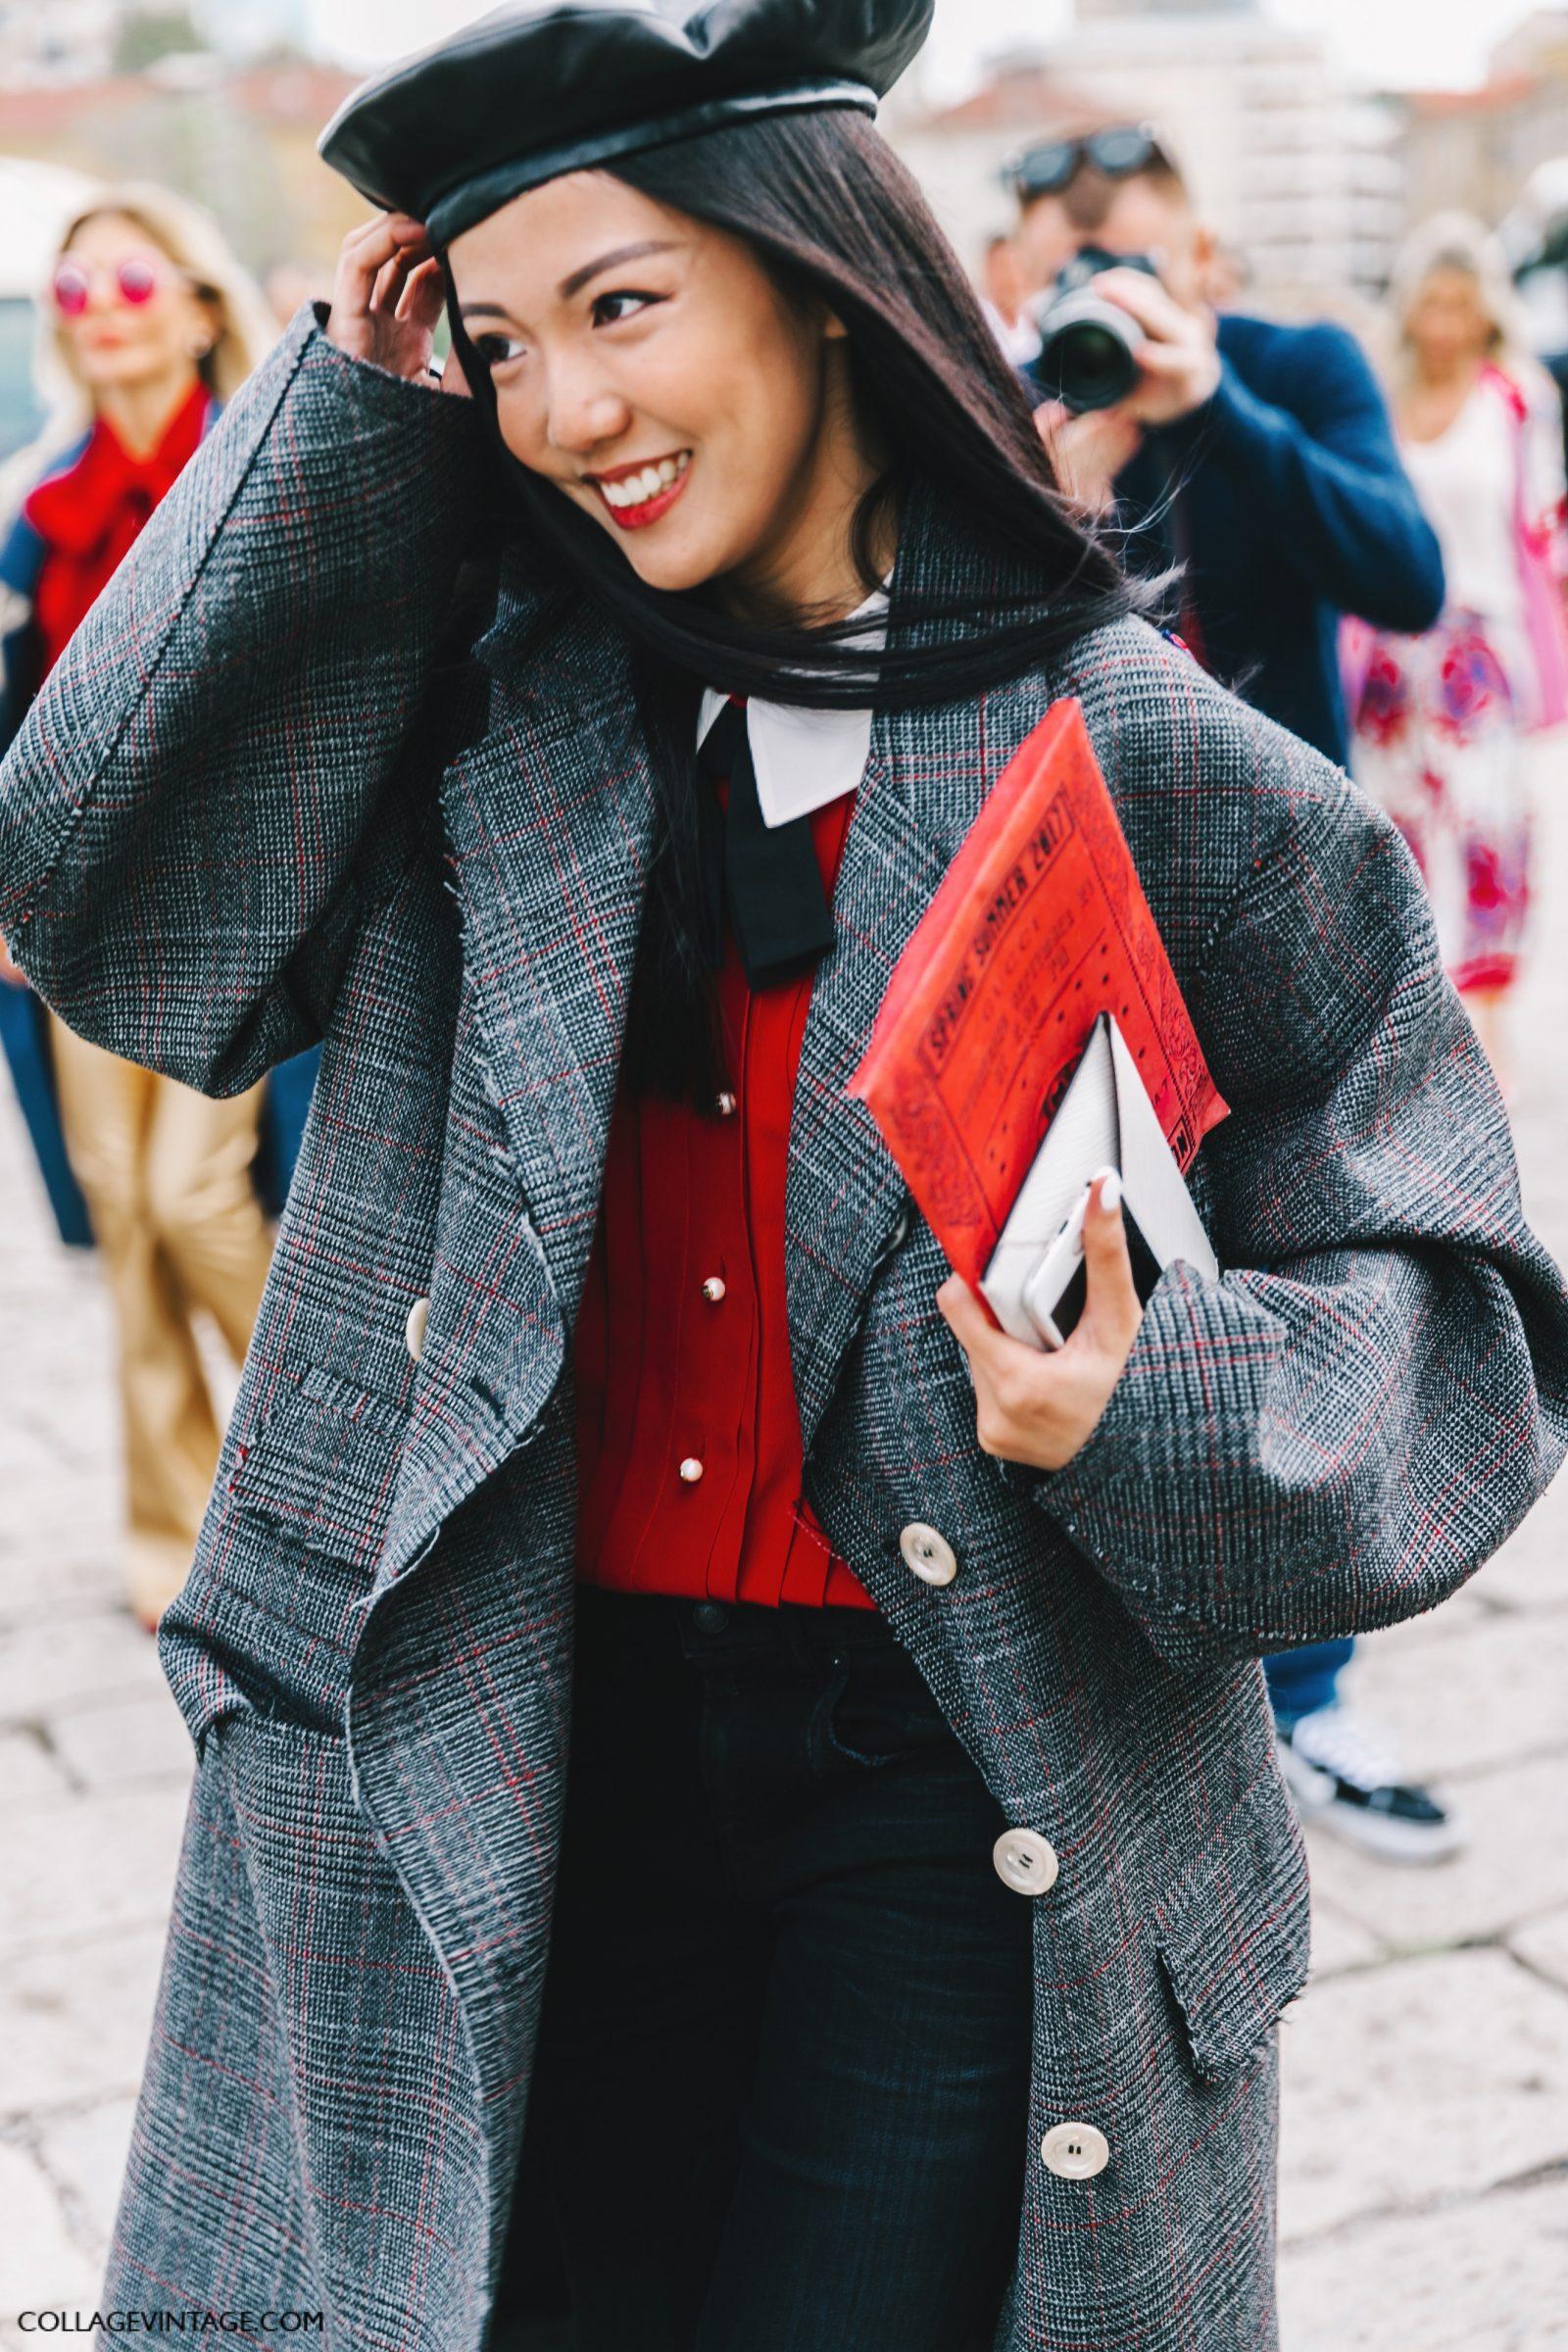 mfw-milan_fashion_week_ss17-street_style-outfits-collage_vintage-gucci-numero_21-alberta_ferreti-58